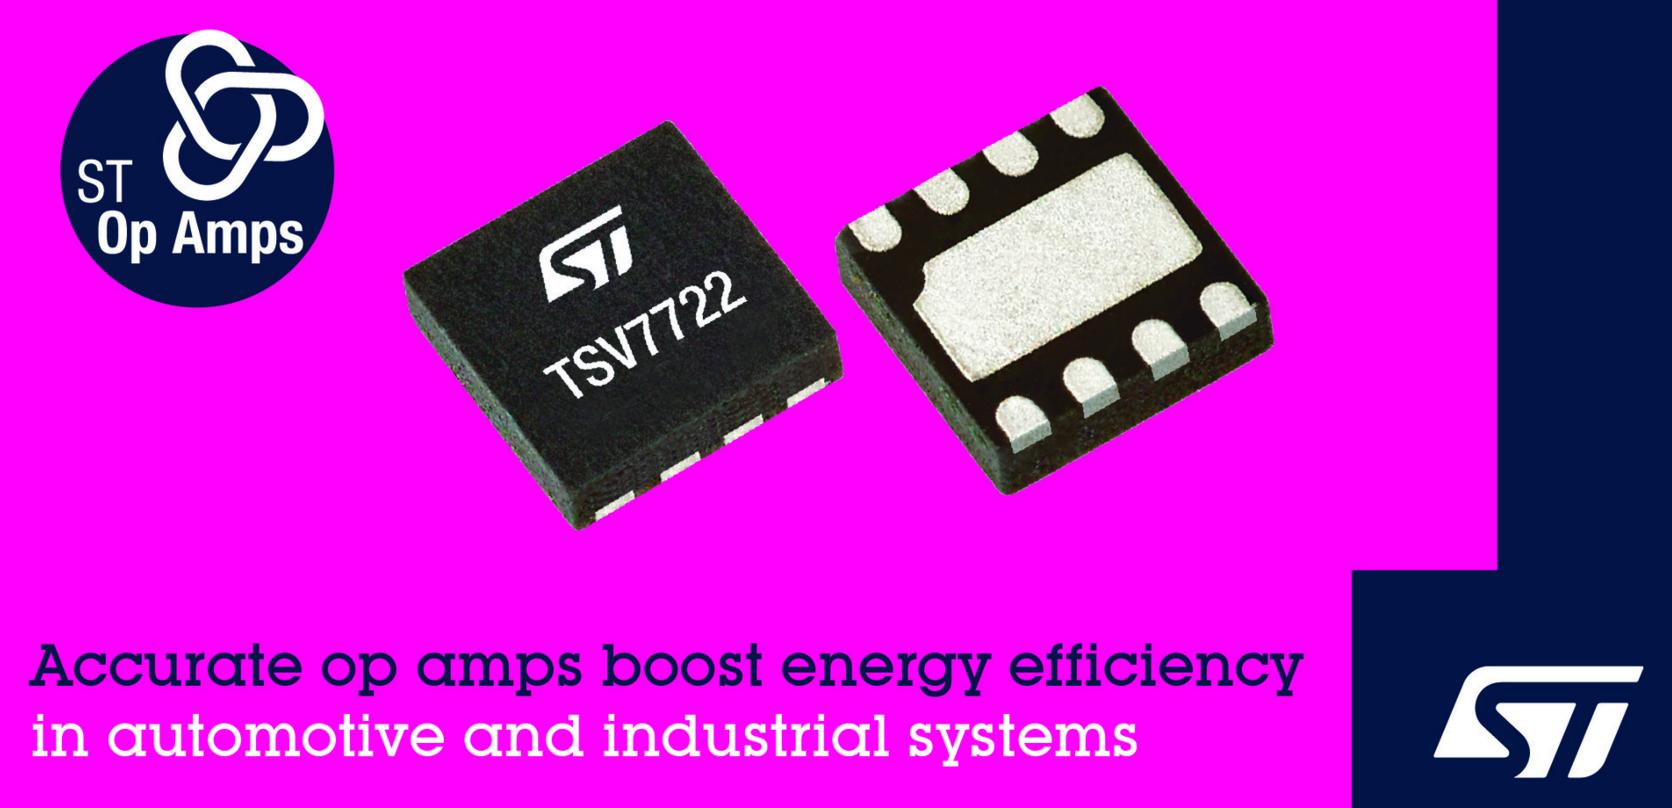 ST高精度高帶寬運算放大器問市,可實現22MHz增益帶寬